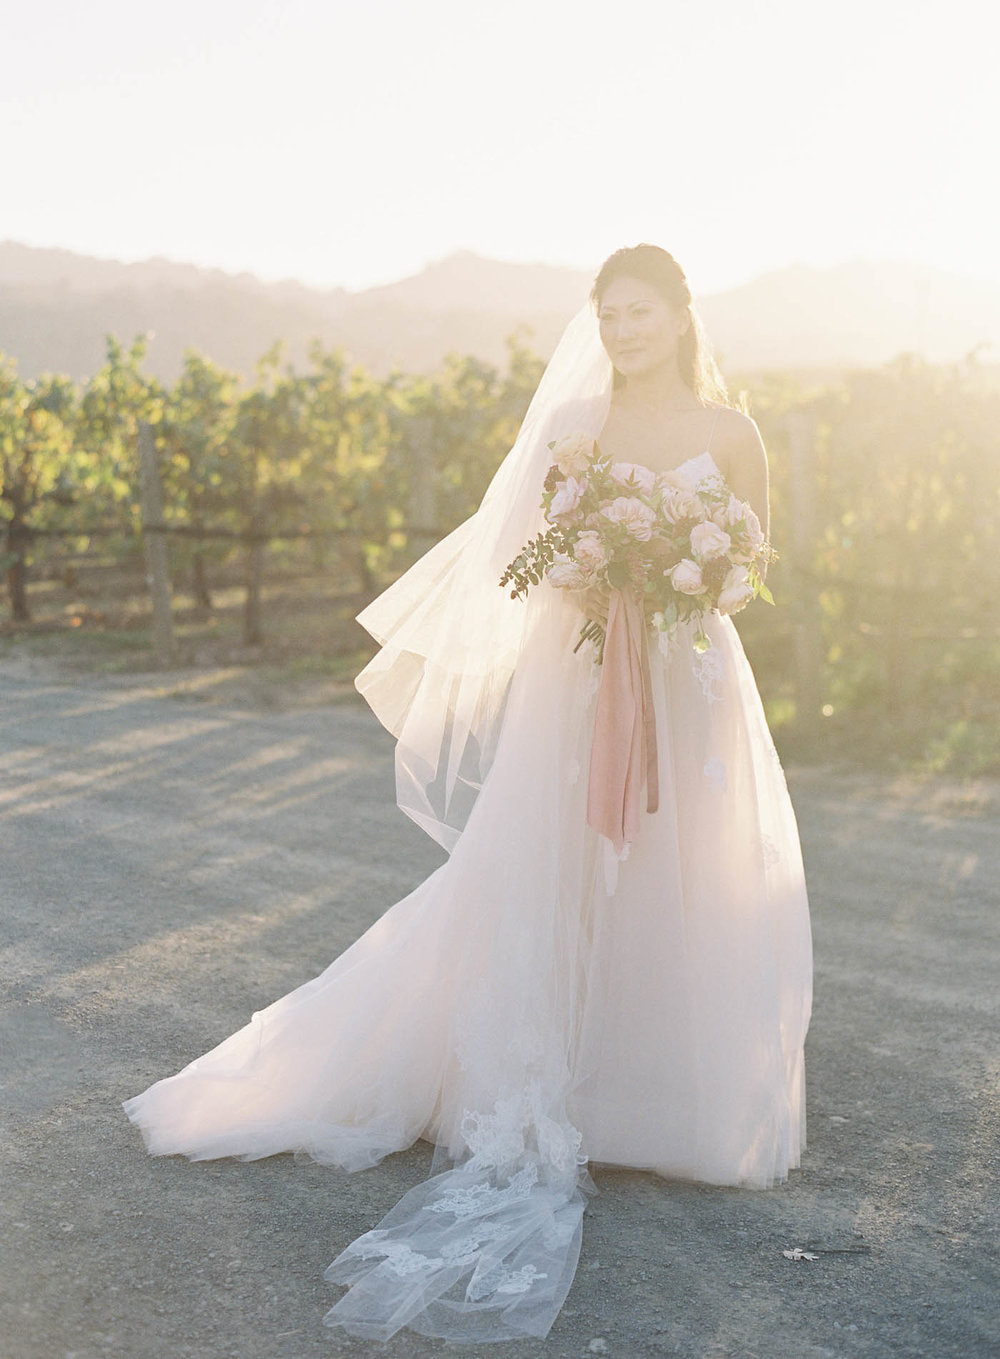 sunstone-villa-wedding-18-Jen_Huang-RD-107-Jen_Huang-009586-R1-005.jpg